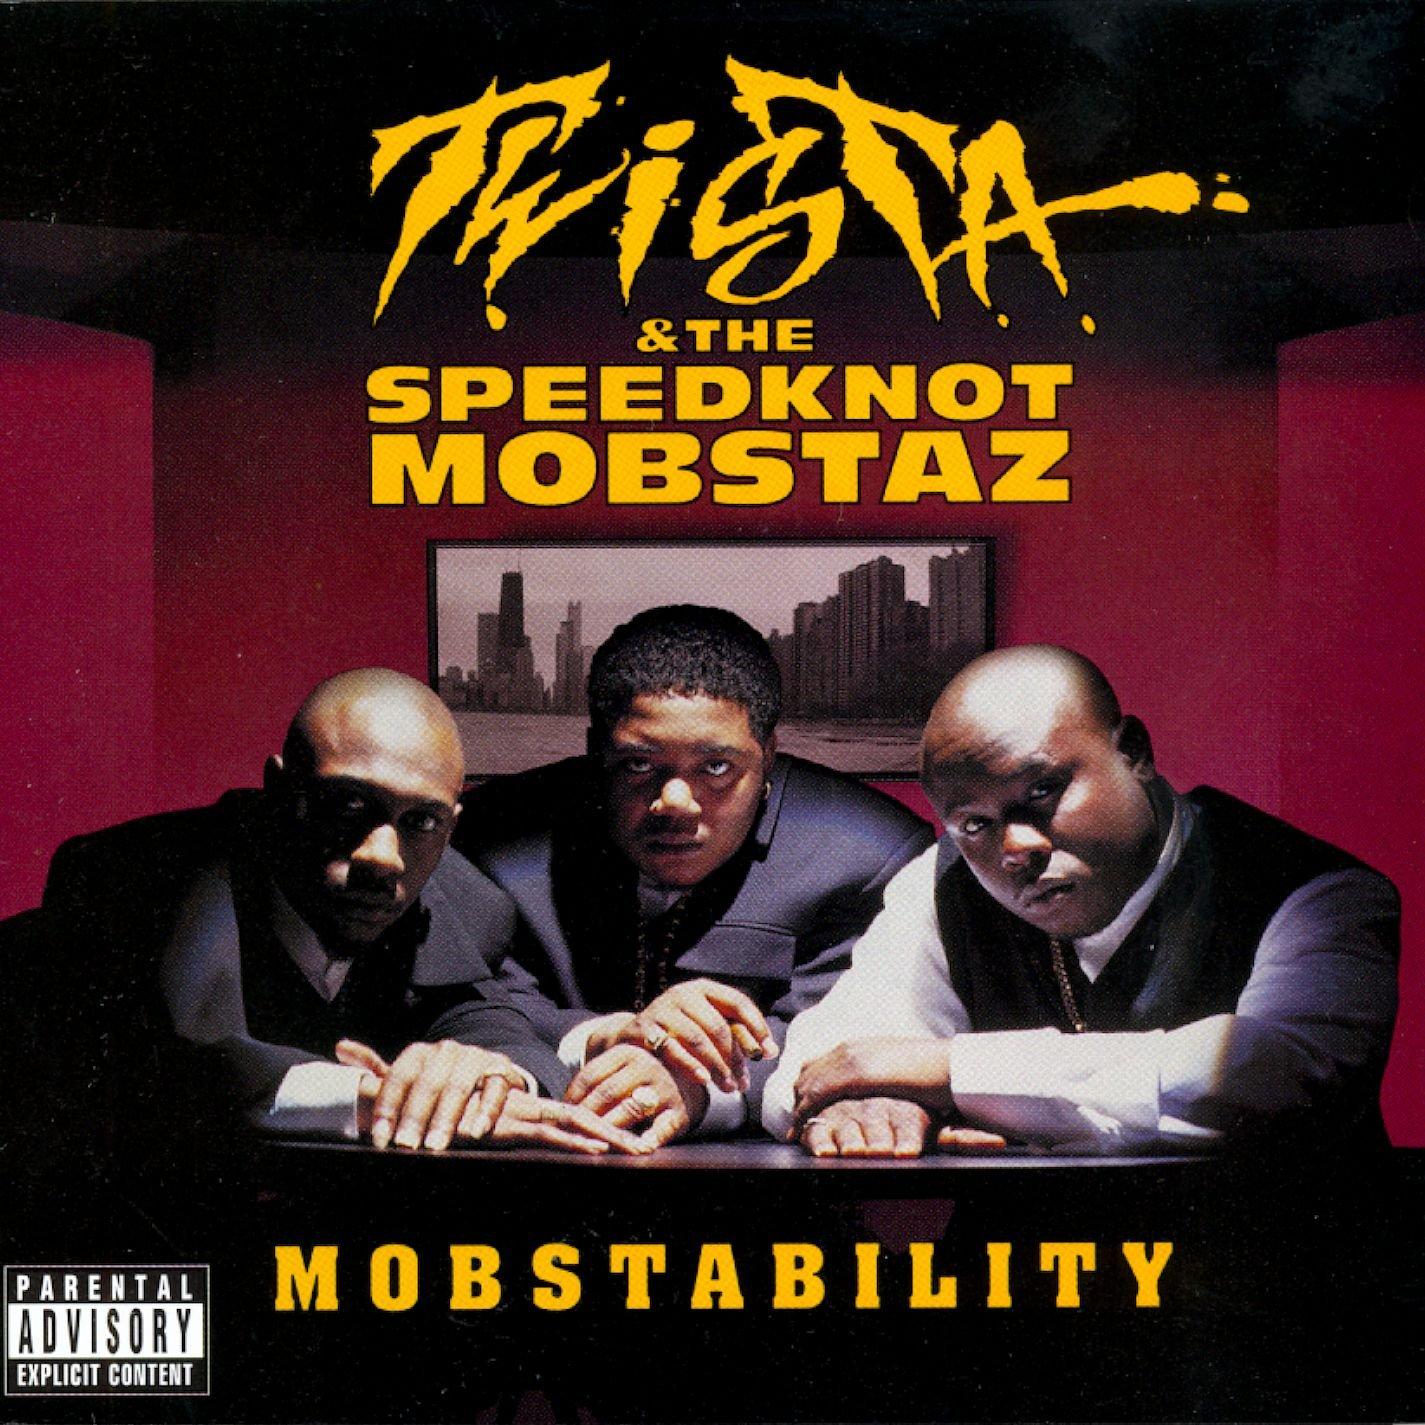 Twista & The Speedknot Mobstaz - Mobstability (1998) [FLAC] Download